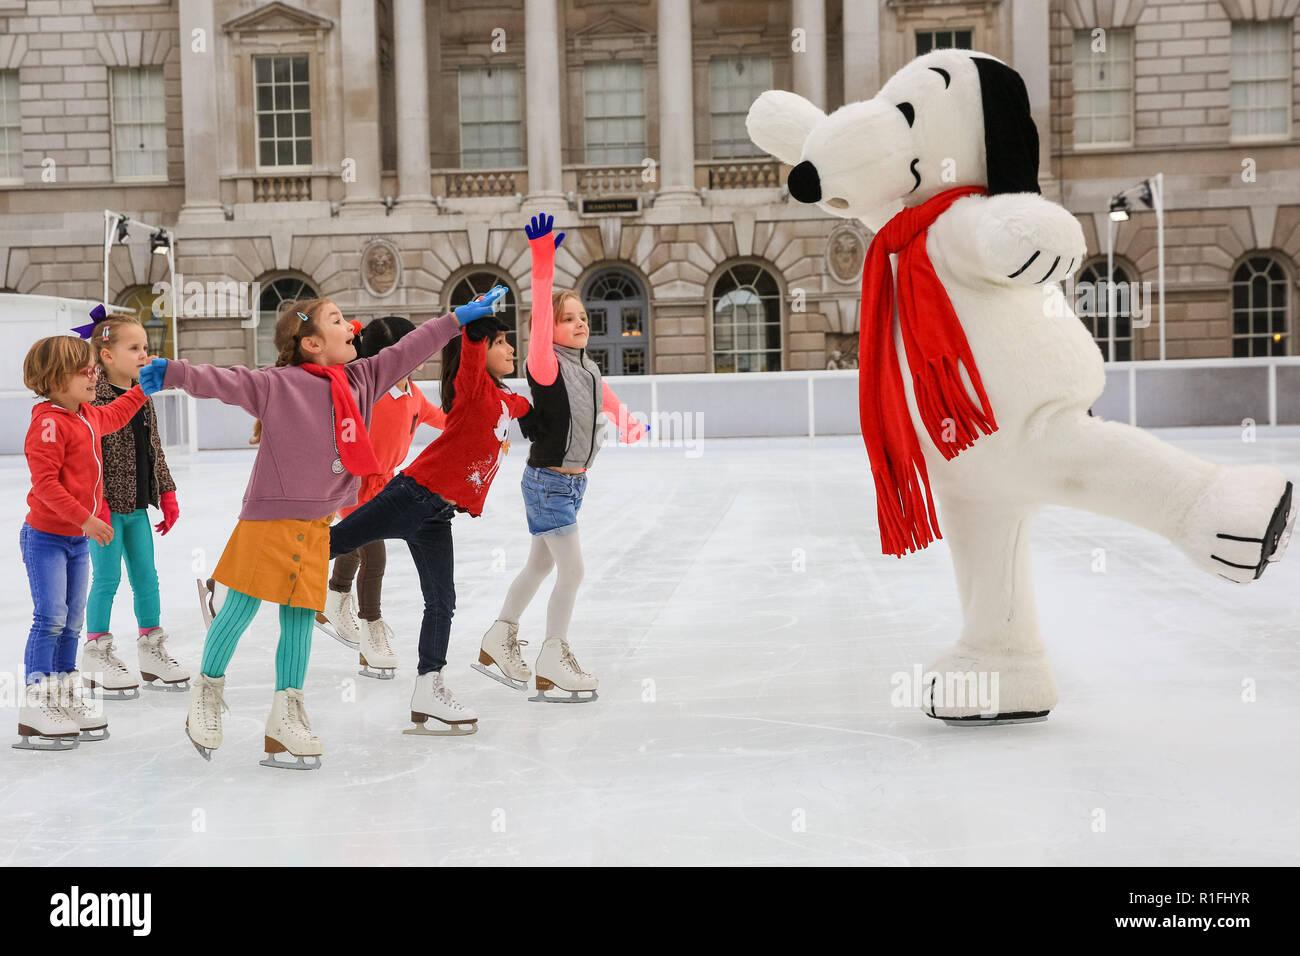 Somerset House, London, UK  12th Nov, 2018  Snoopy, Charlie